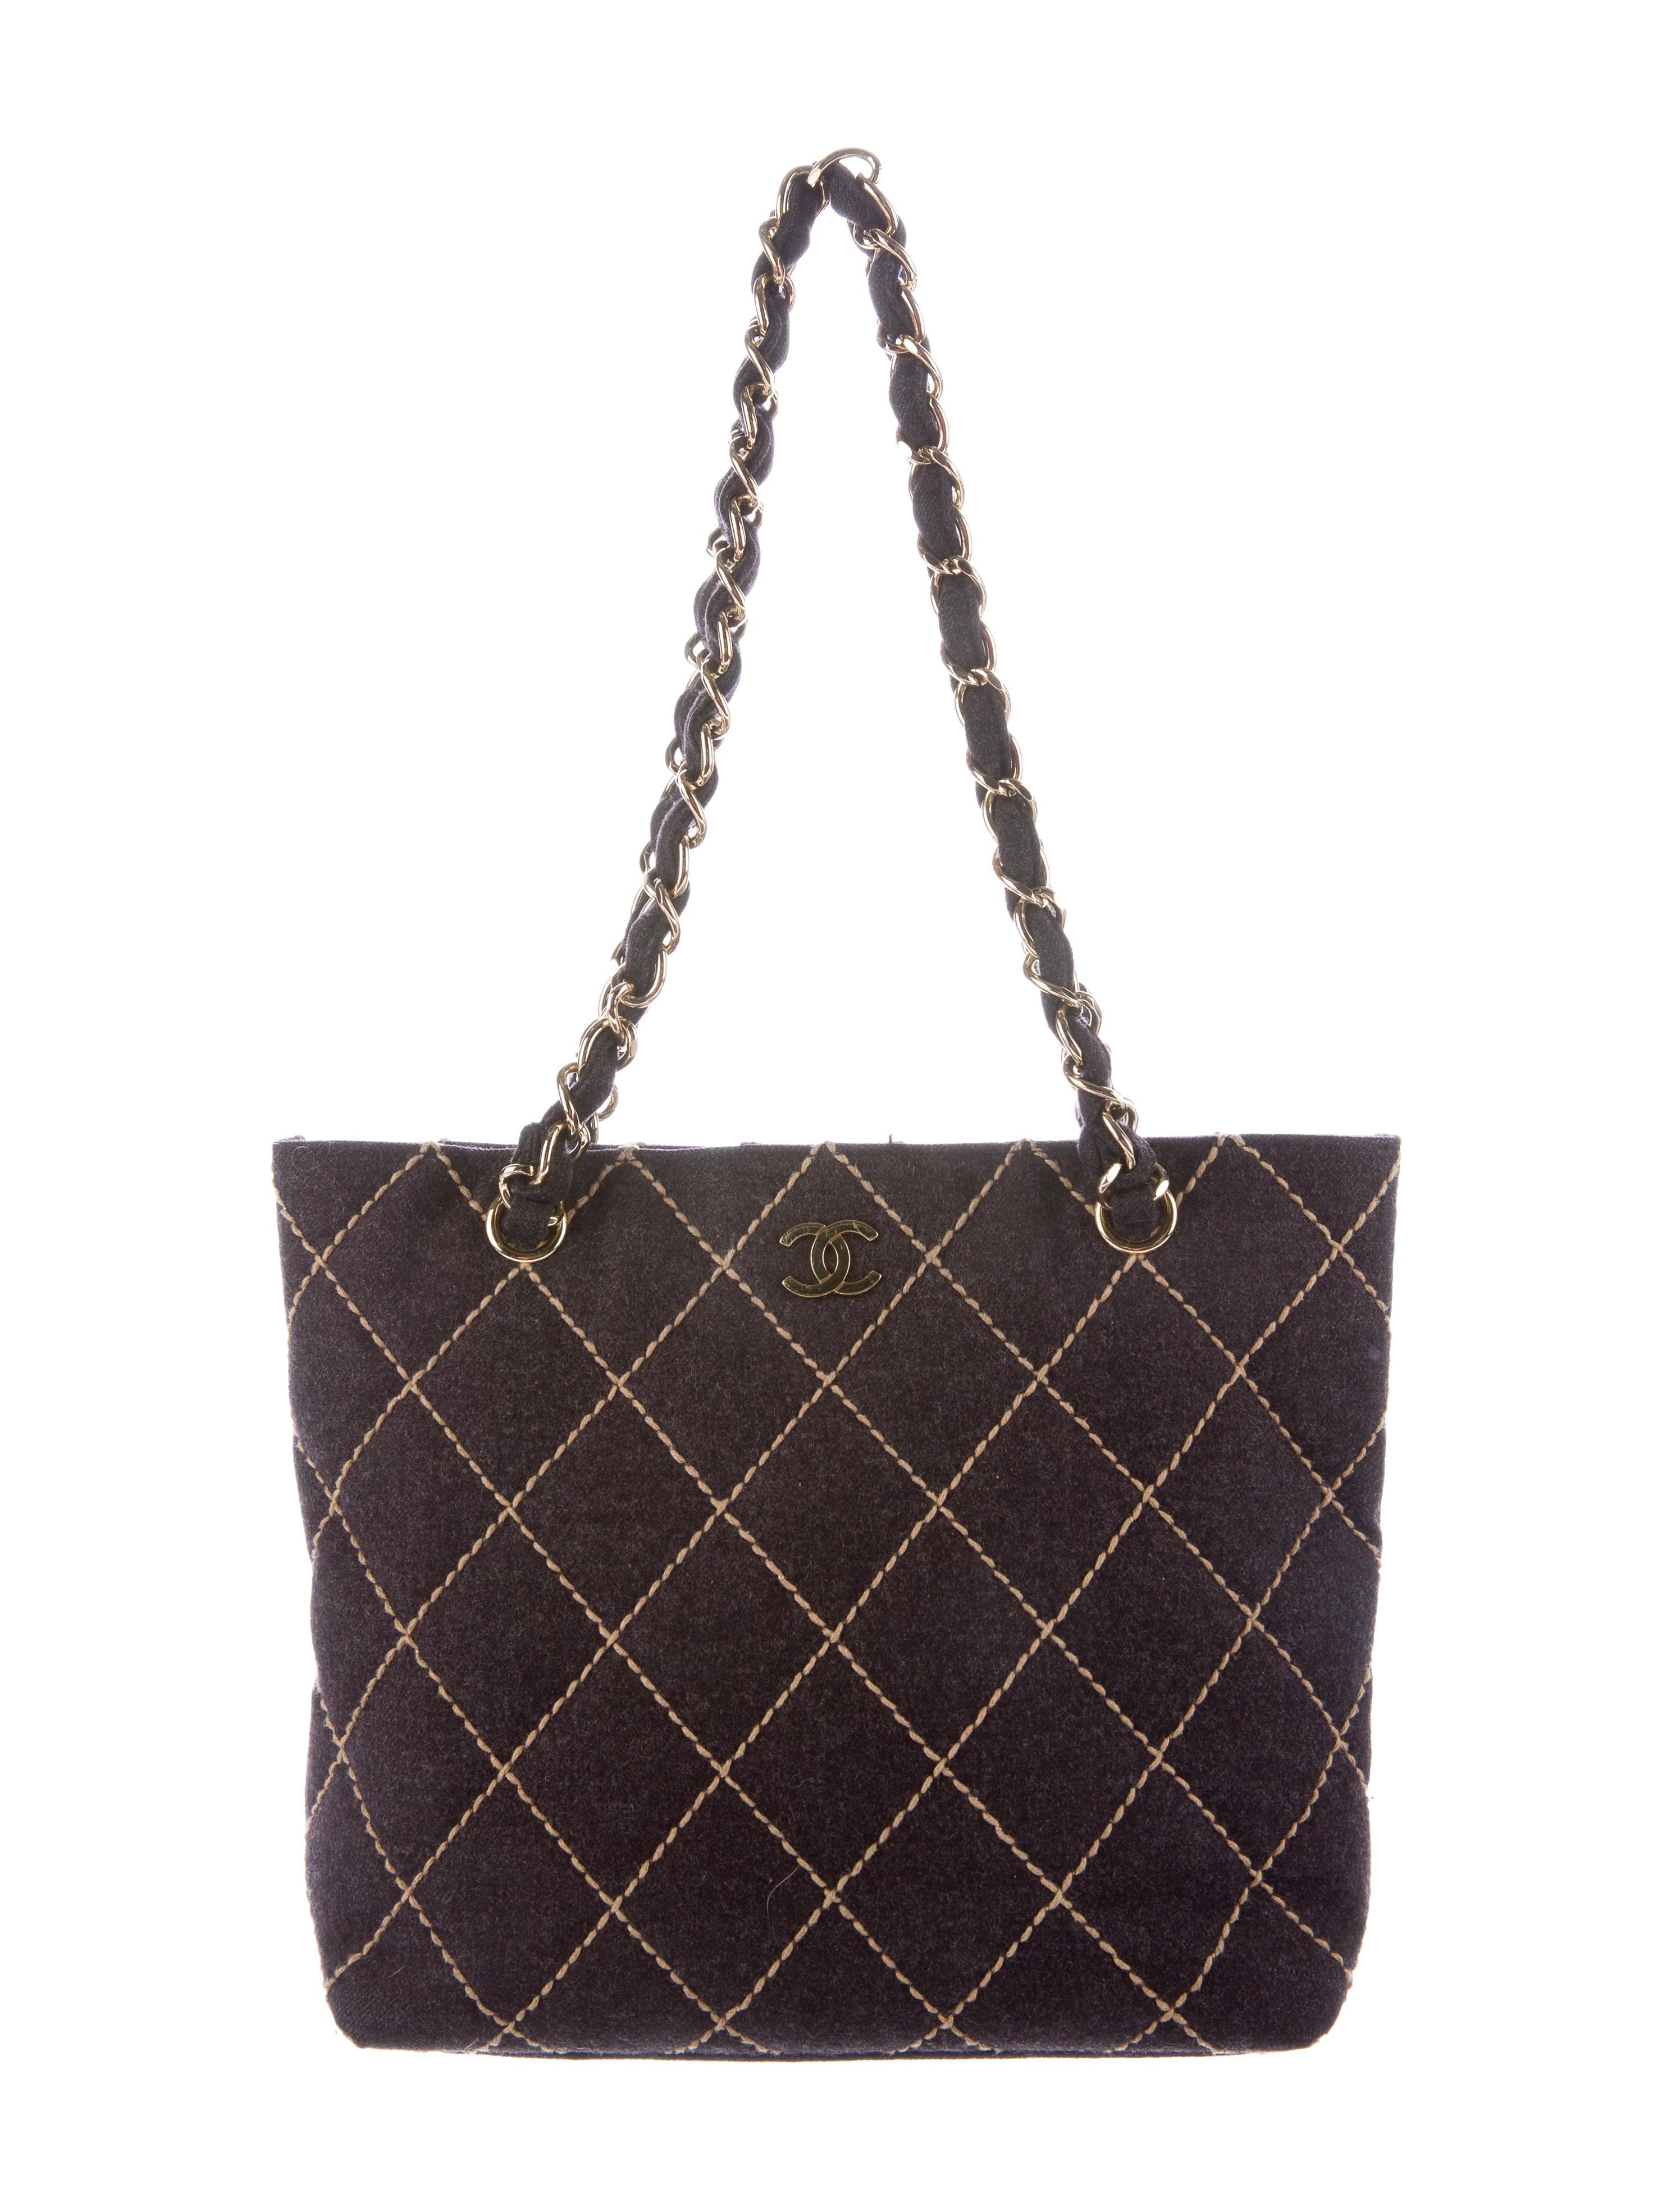 d24a68898811 Chanel Wool Surpique Tote - Handbags - CHA129617